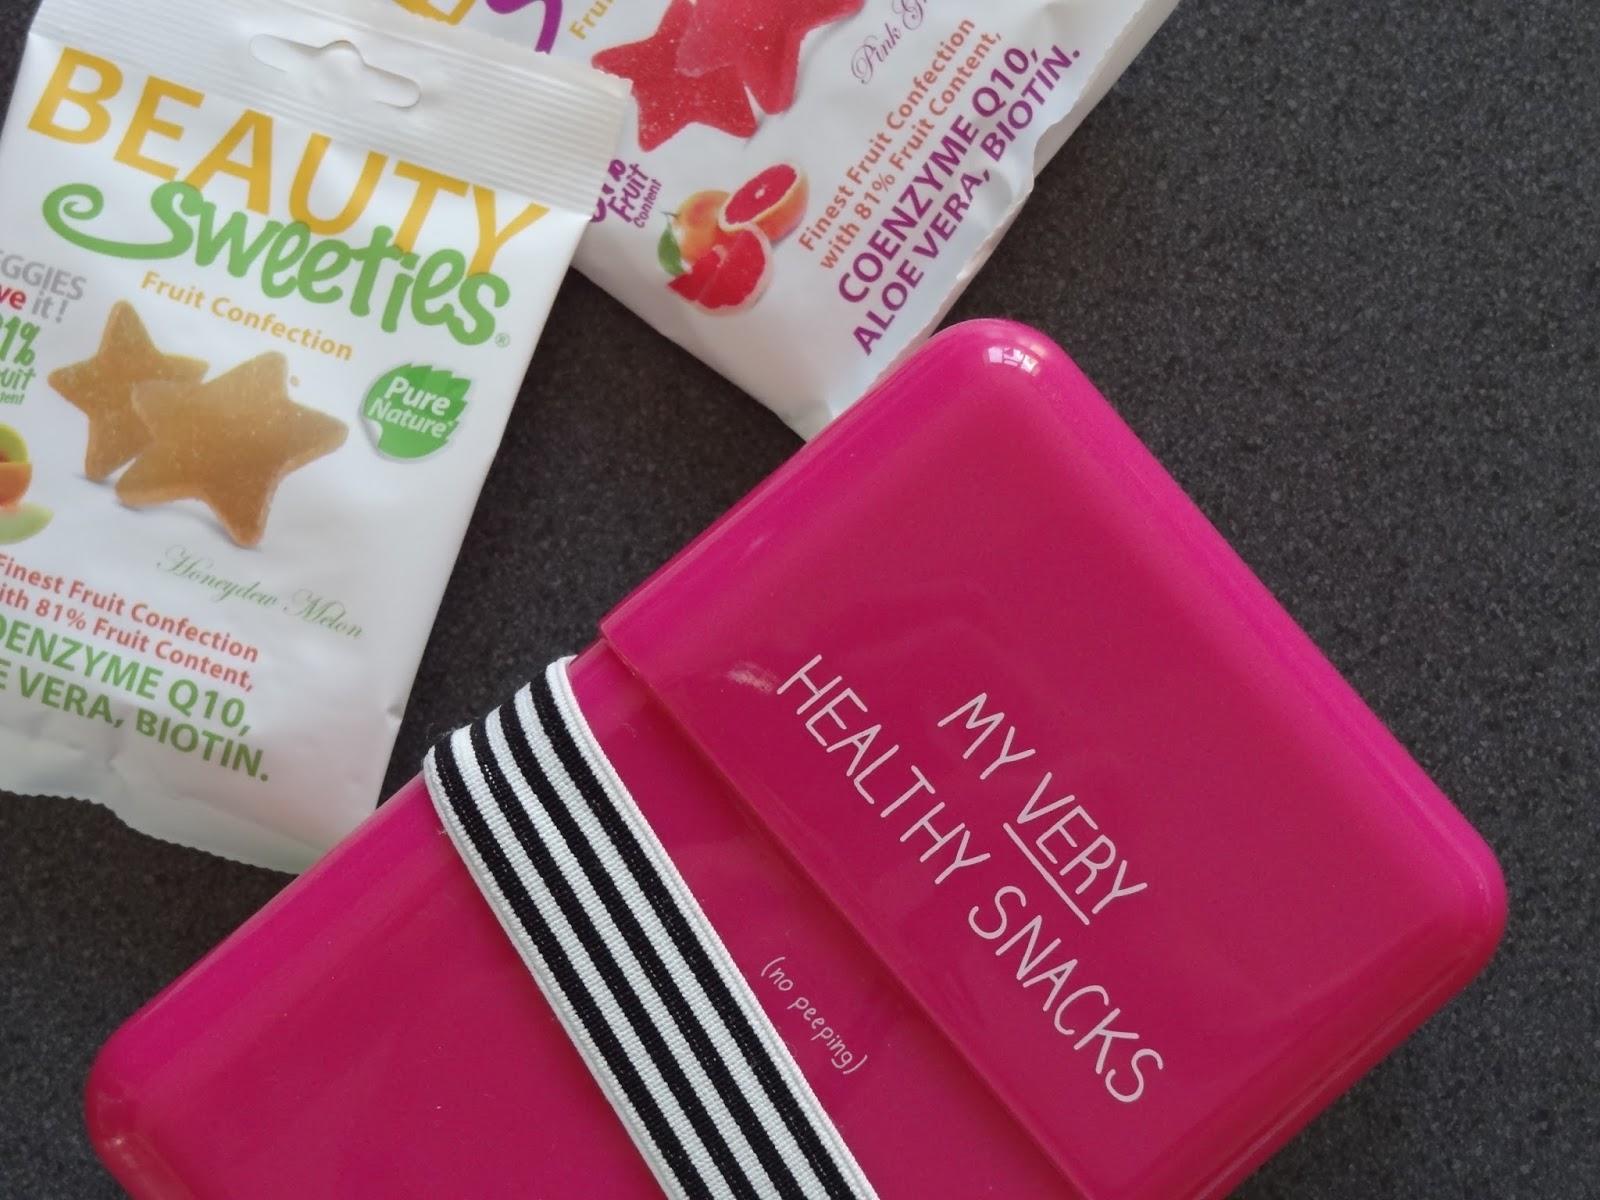 Holland and Barrett Beauty Sweeties Healthy Snacks